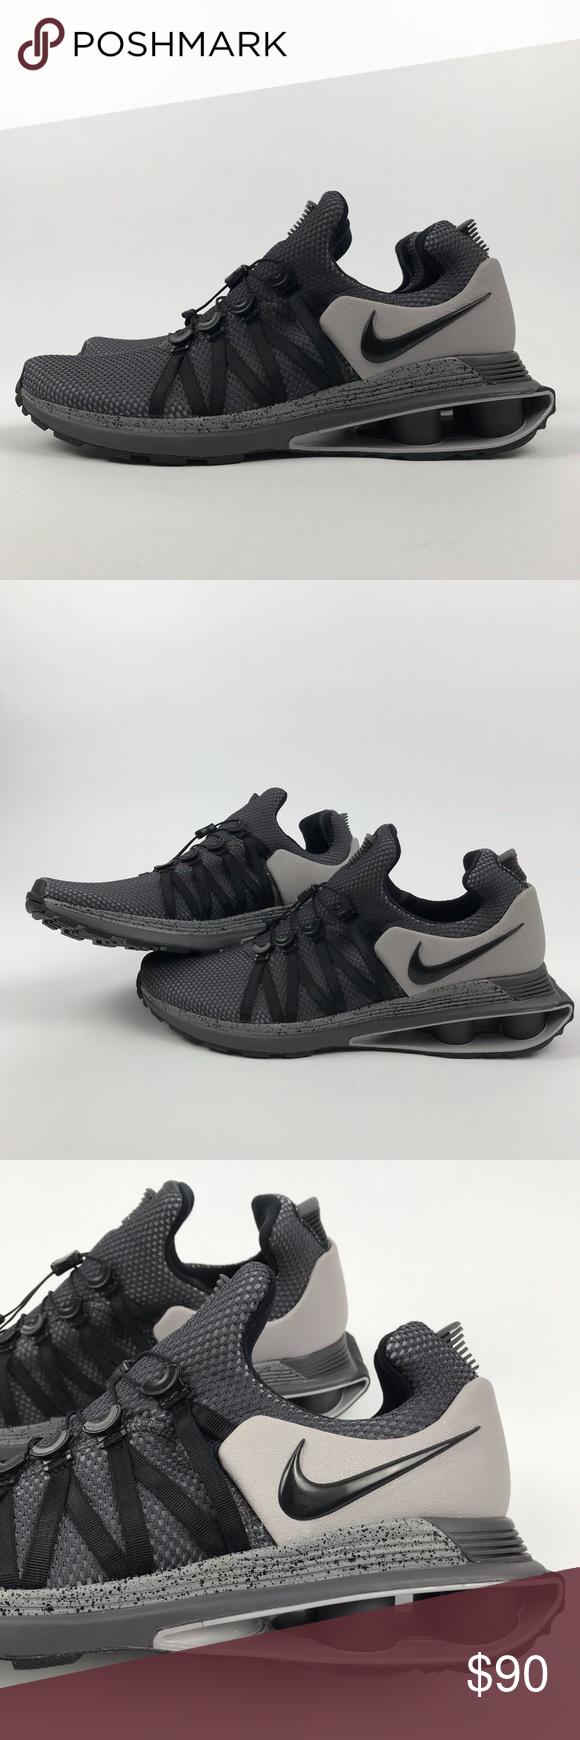 4a2fe3a38b7 Nike Shox Gravity Shoes Men s 10 gray black NWOB New (Without Box) Nike  Shox Gravity Atmosphere Grey Black Running Shoes Men s sz 10 Ar1999-011.